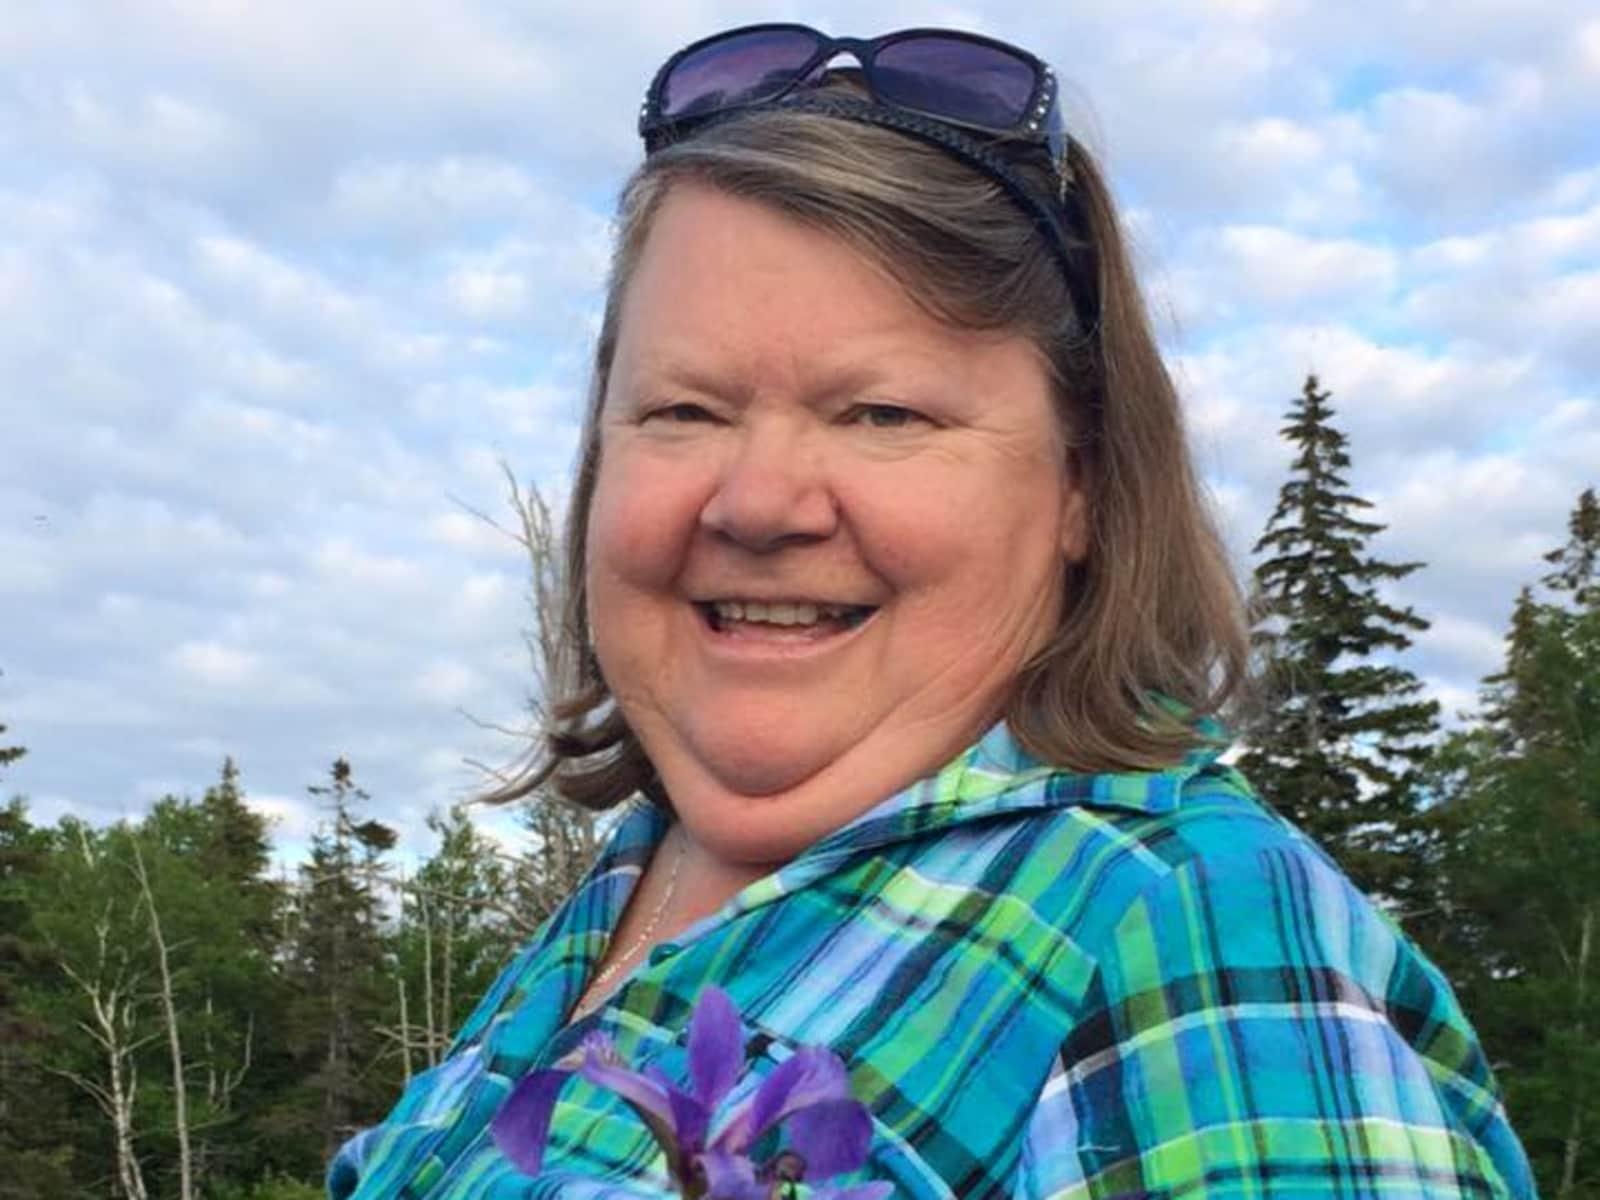 Linda from Calgary, Alberta, Canada